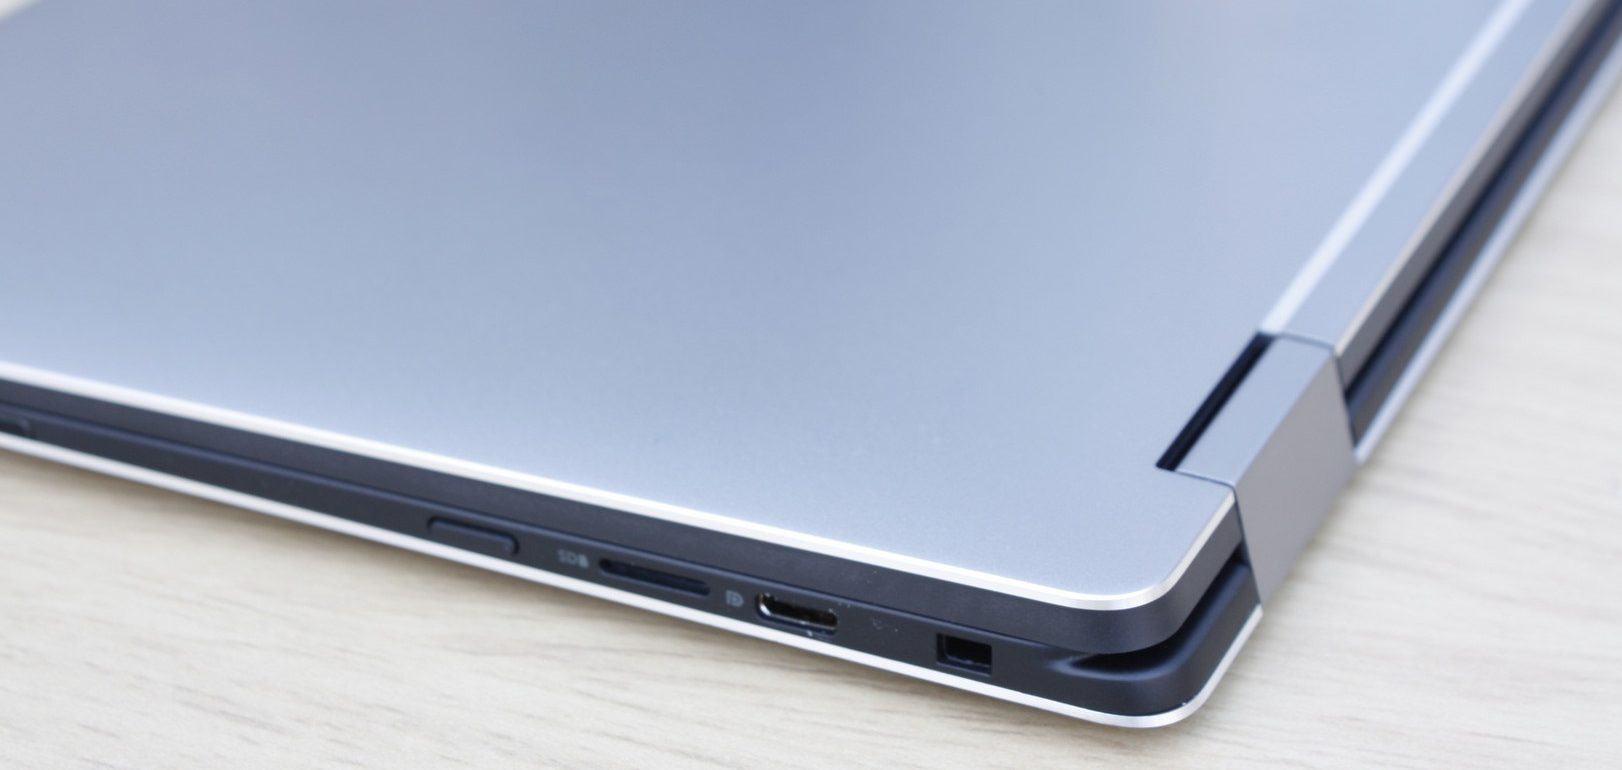 đánh giá laptop Dell XPS 13 9365 2 in 1